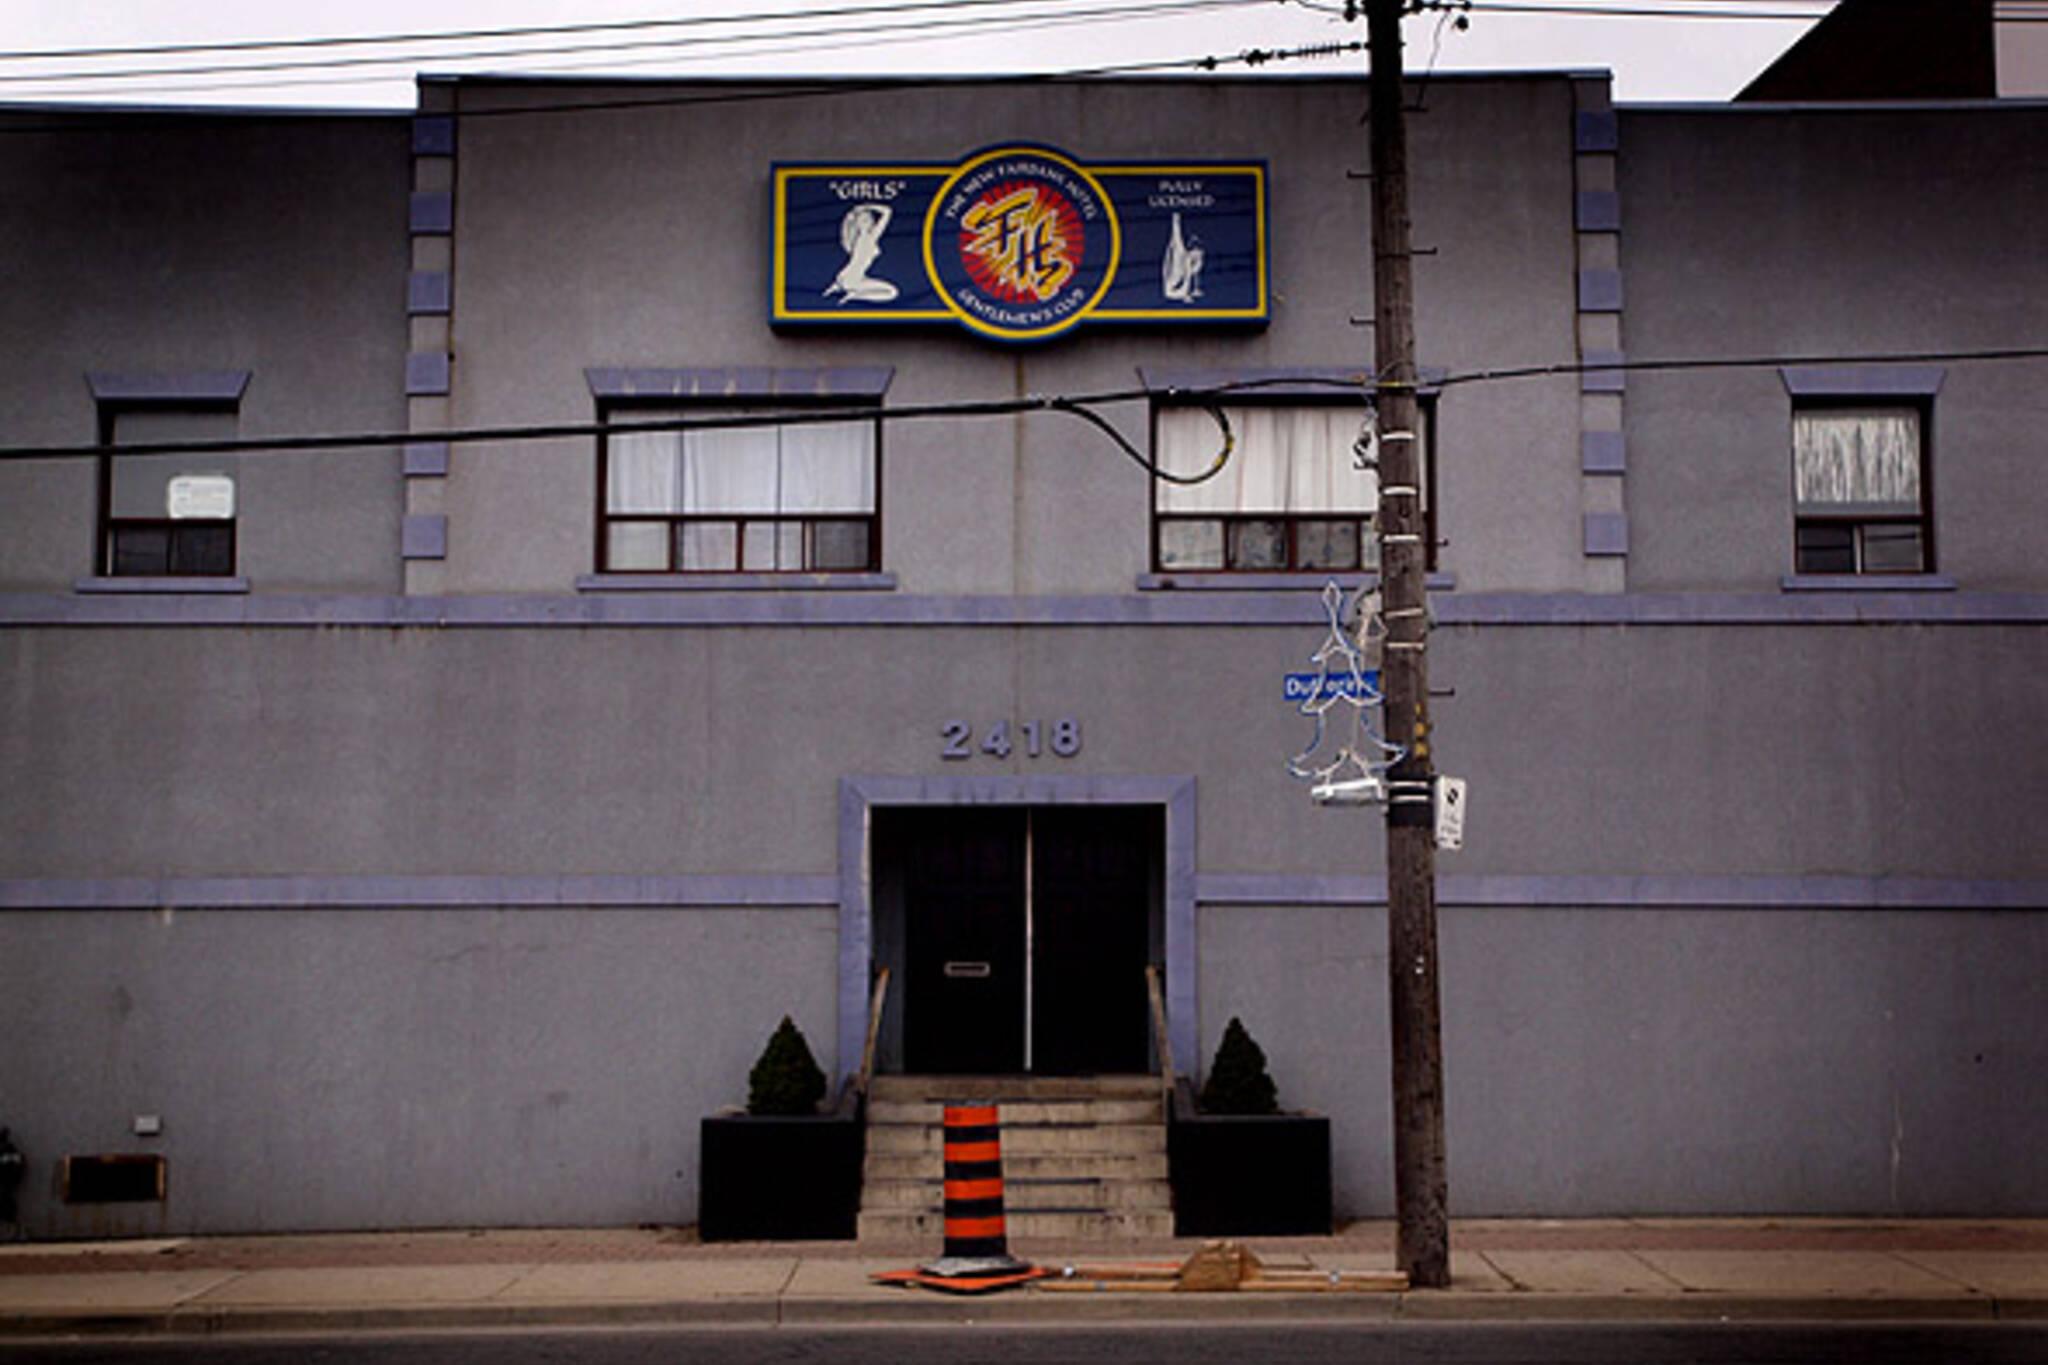 Fairbanks Hotel Toronto